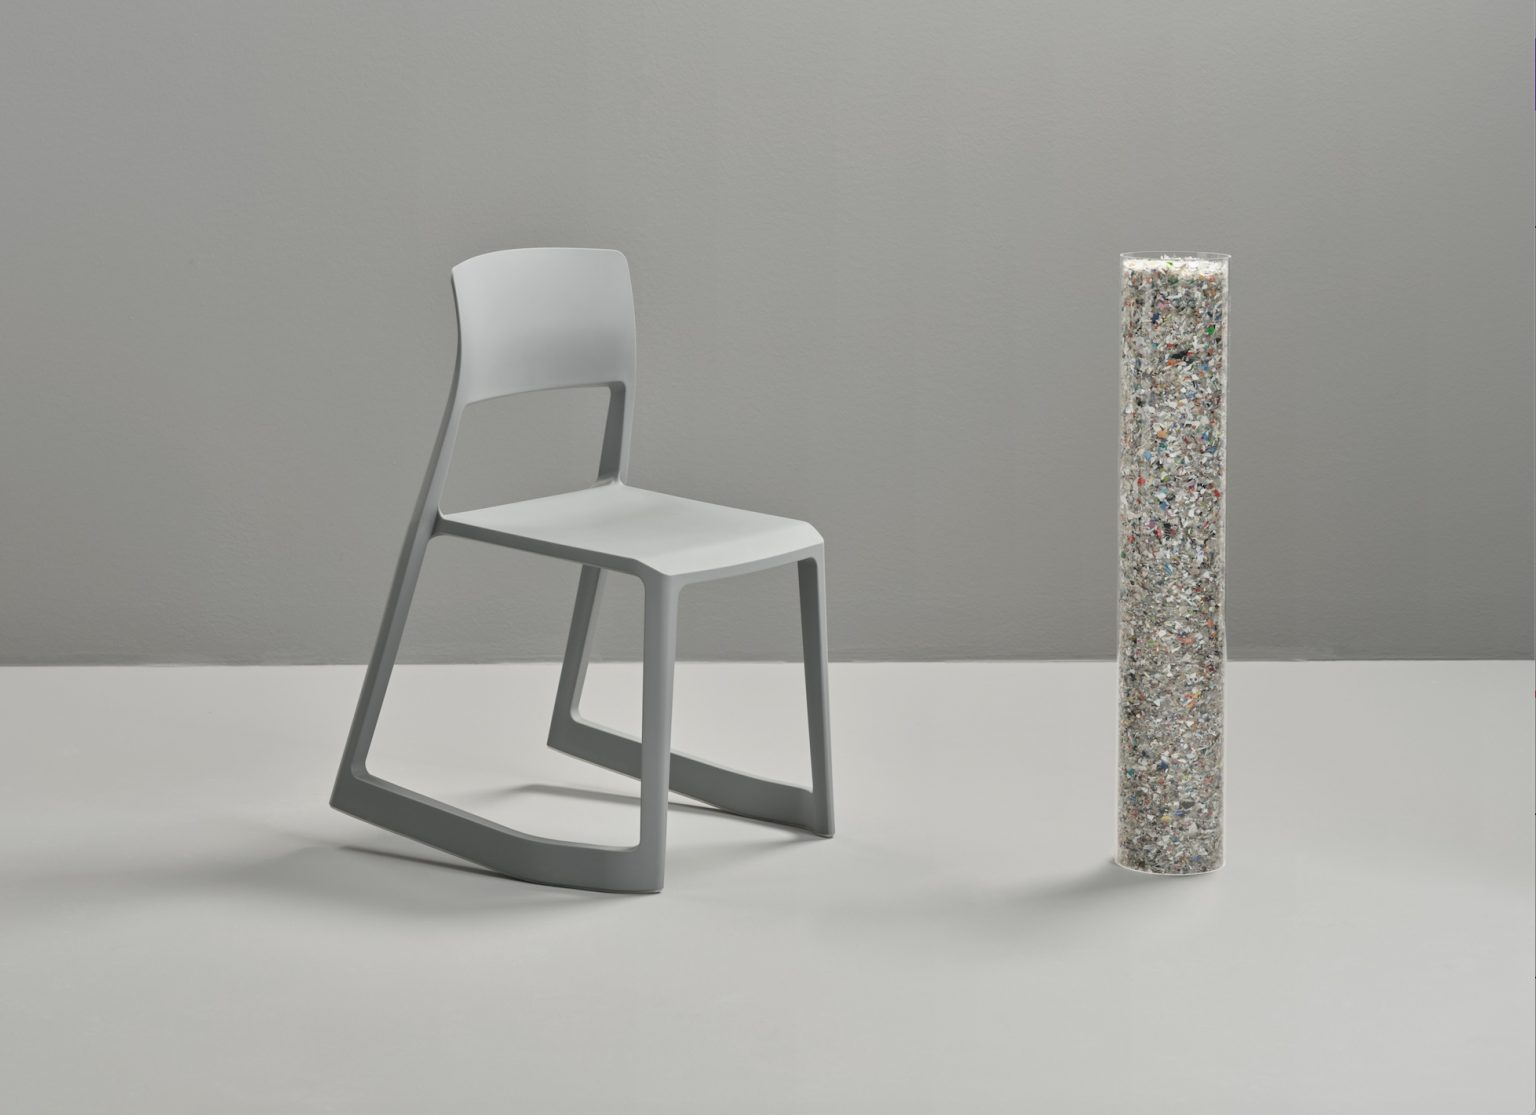 Biennale Interieur - Belgium's leading design and interior event - Ttr-1-copy.jpg